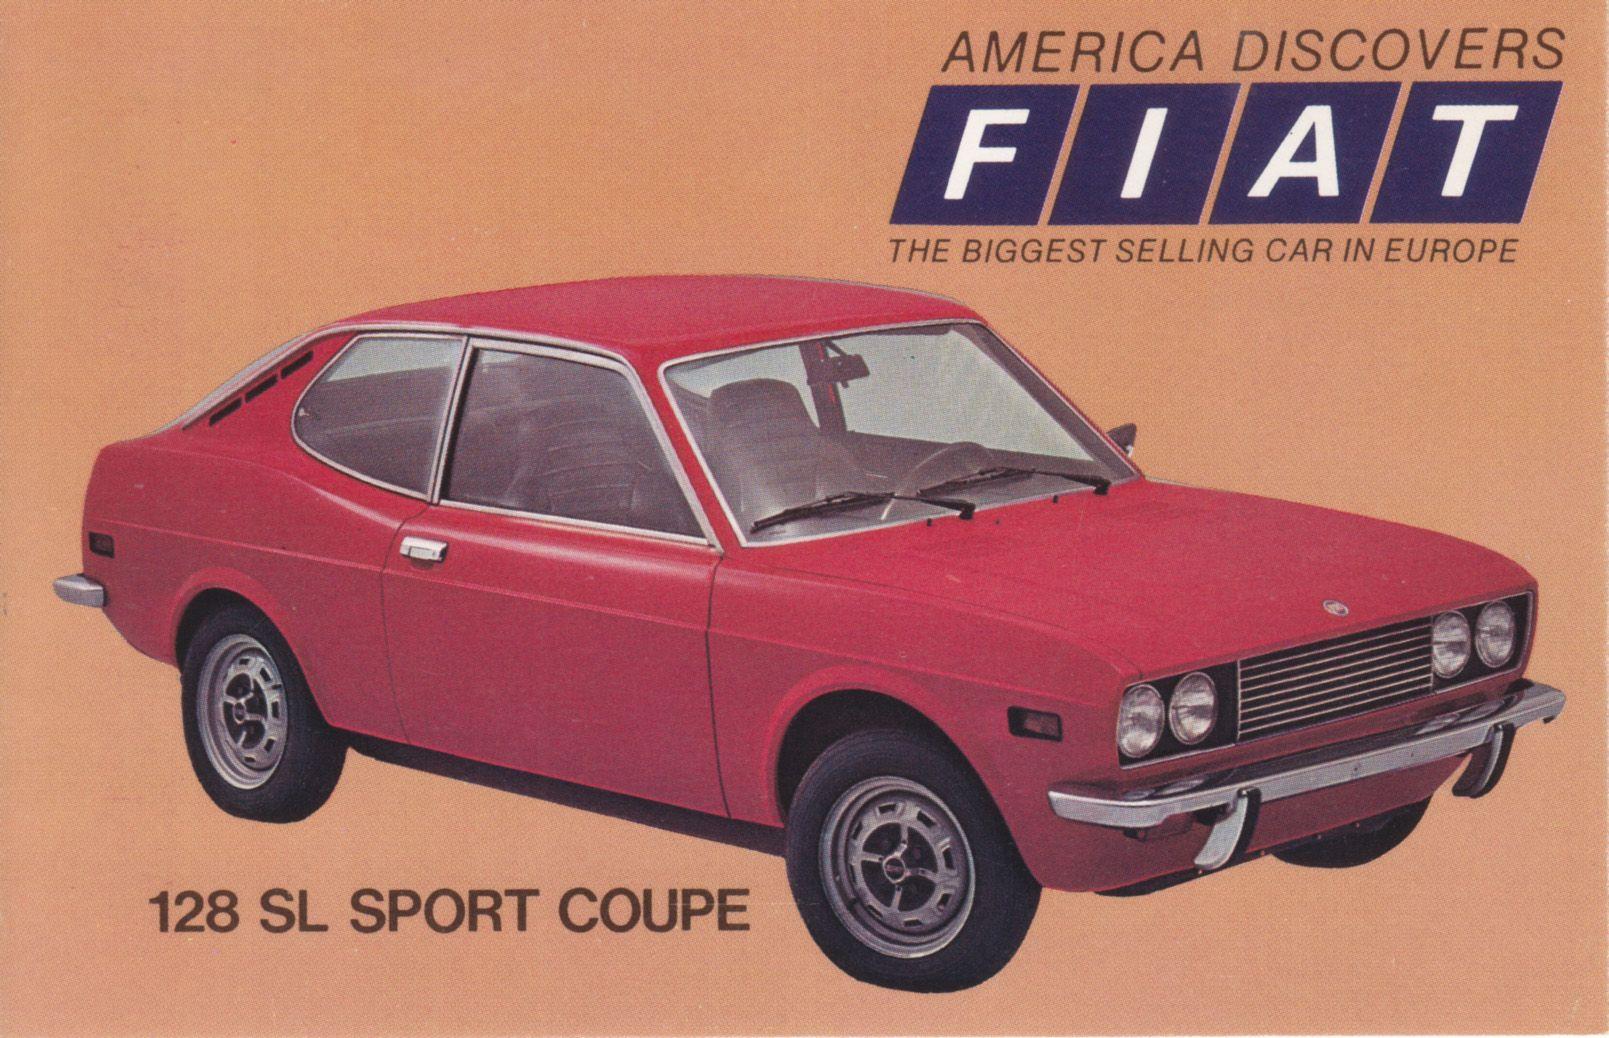 Fiat 128 Sl Sport Coupe Usa 7510 3 1973 Autos Fiat Autos